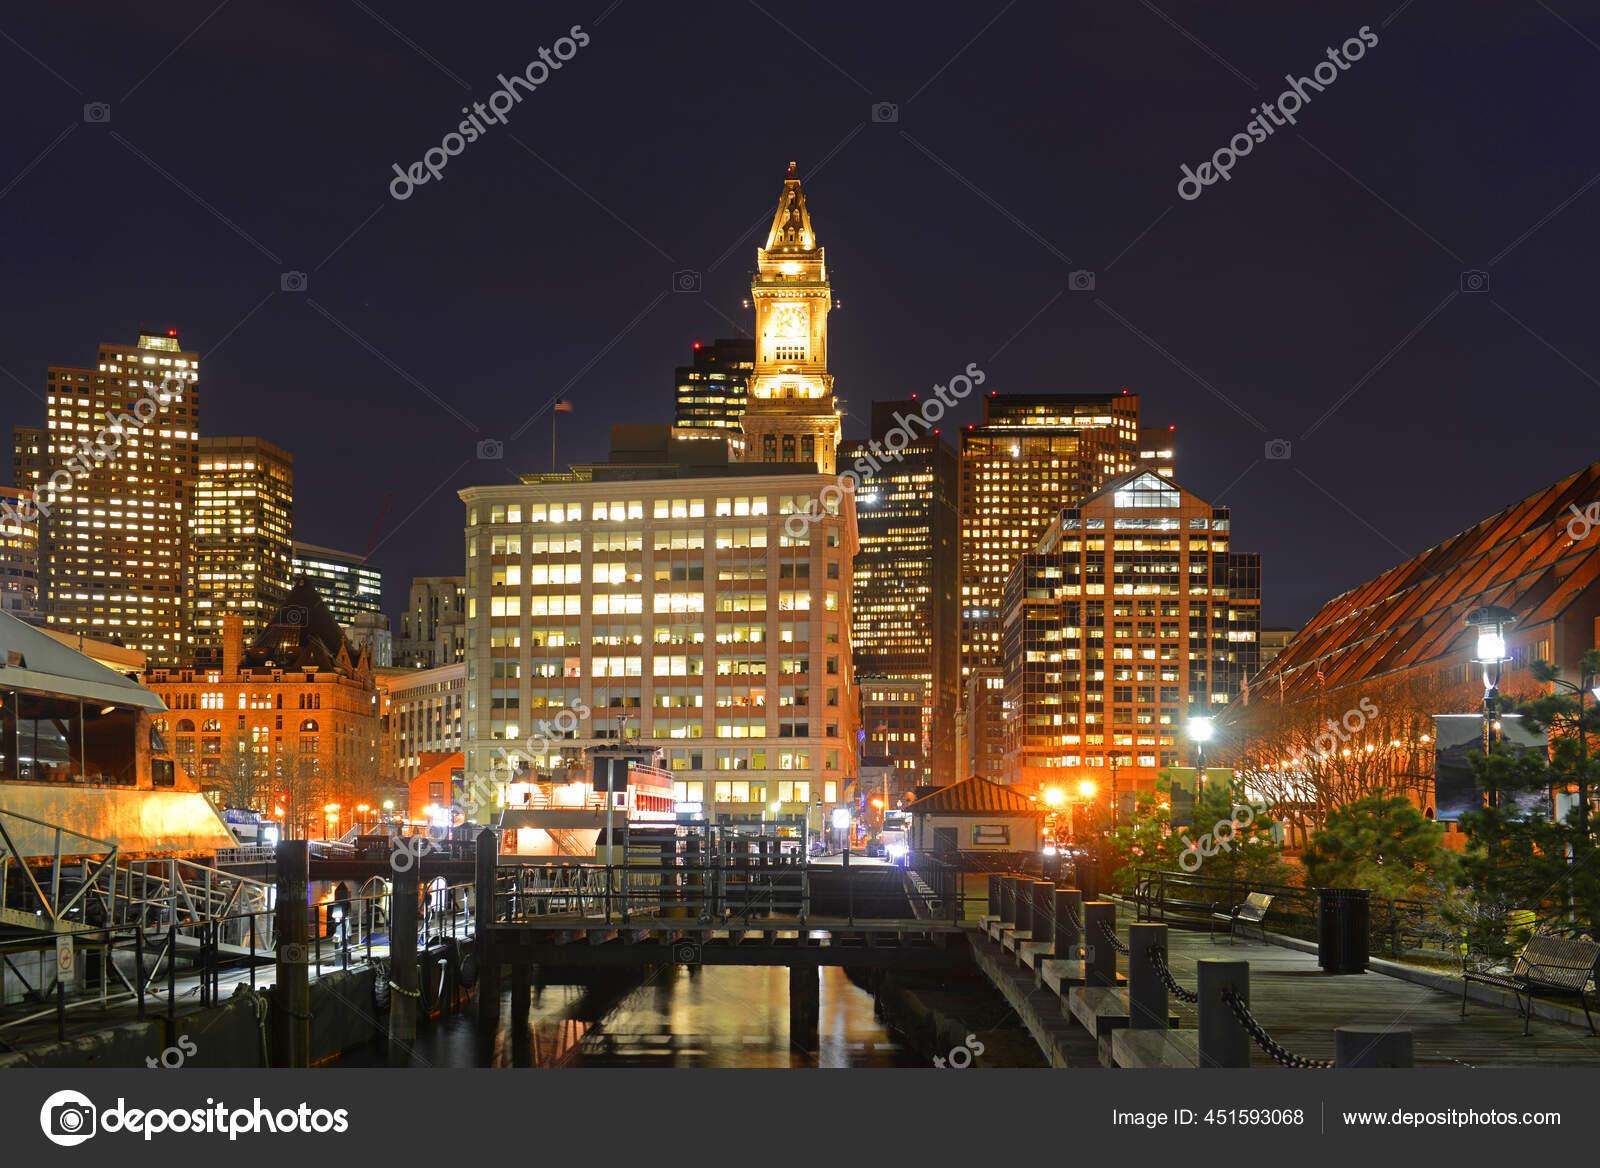 Boston Custom House Long Wharf Financial District Skyline Noite Boston Fotos Imagens De C Jiawangkun 451593068